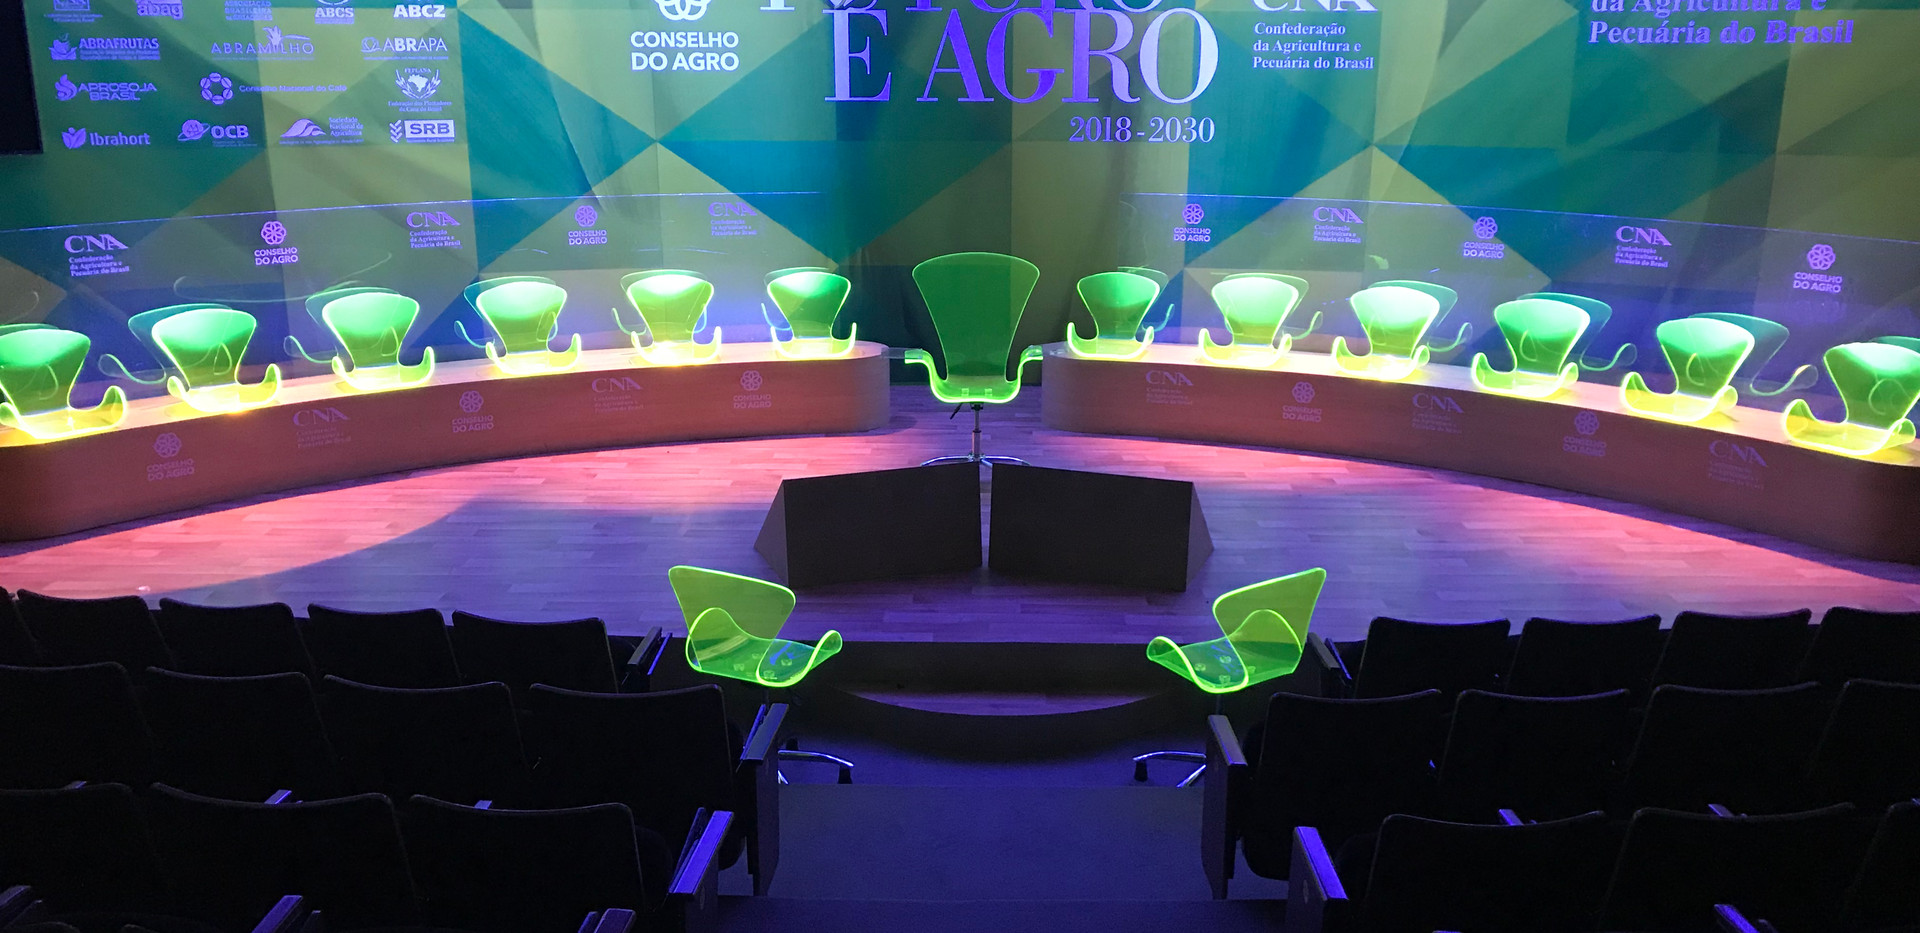 O_Futuro_e_Agro_CNA_Palco